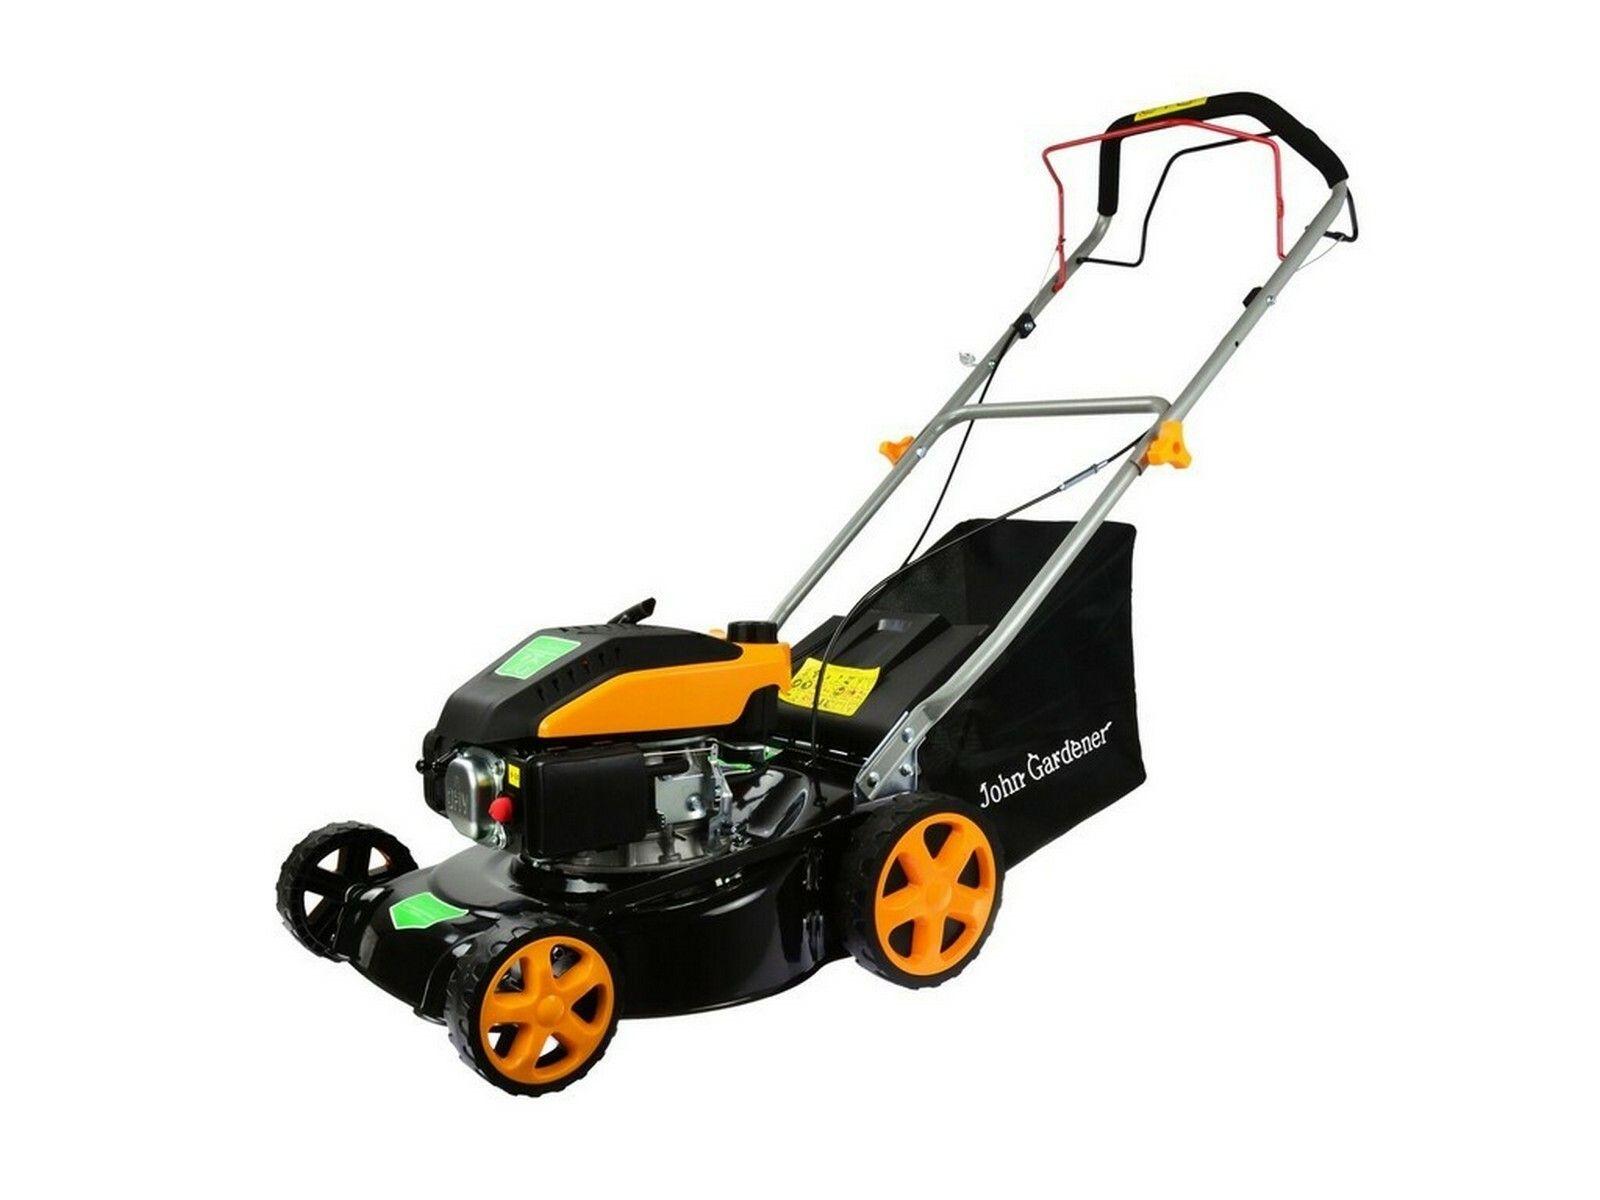 GEKO G83055 benzinová sekačka na trávu G55 s pojezdem 1,8kW, 400mm